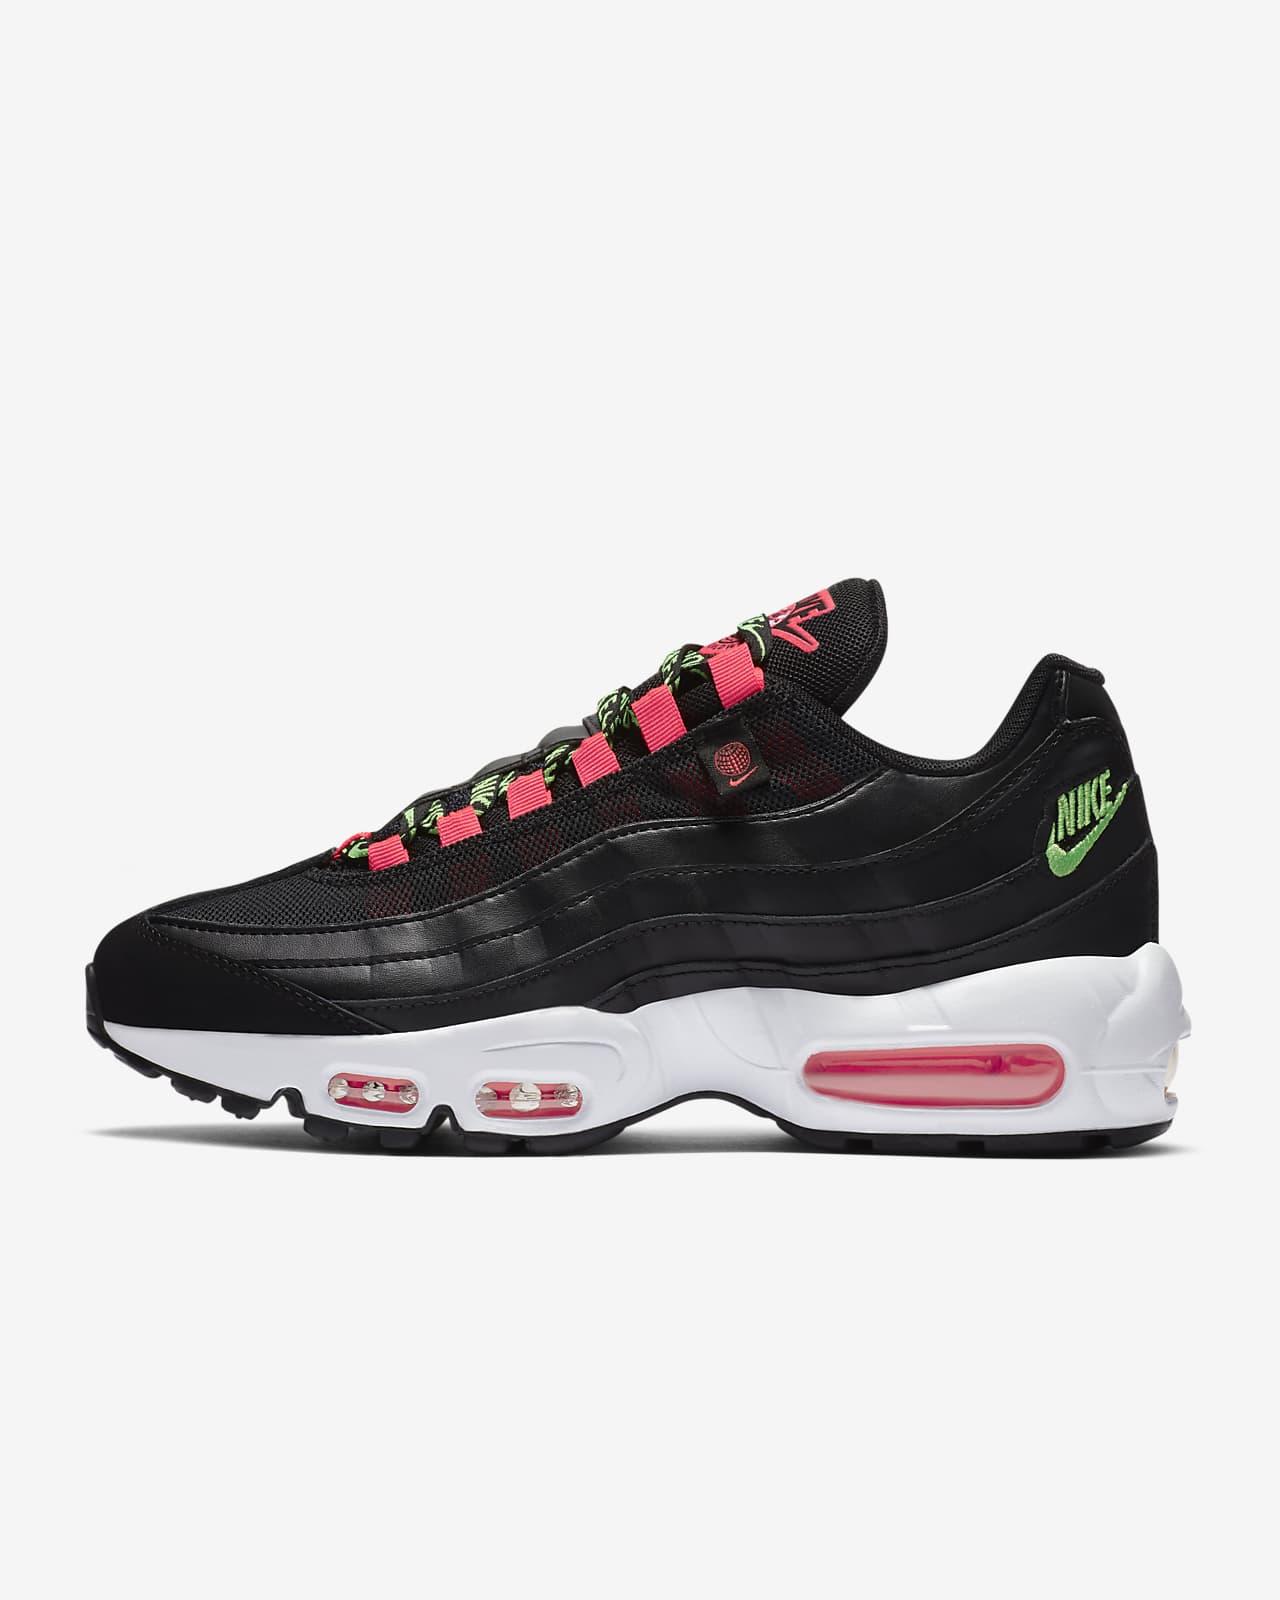 Nike Air Max 95 SE Women's Shoe